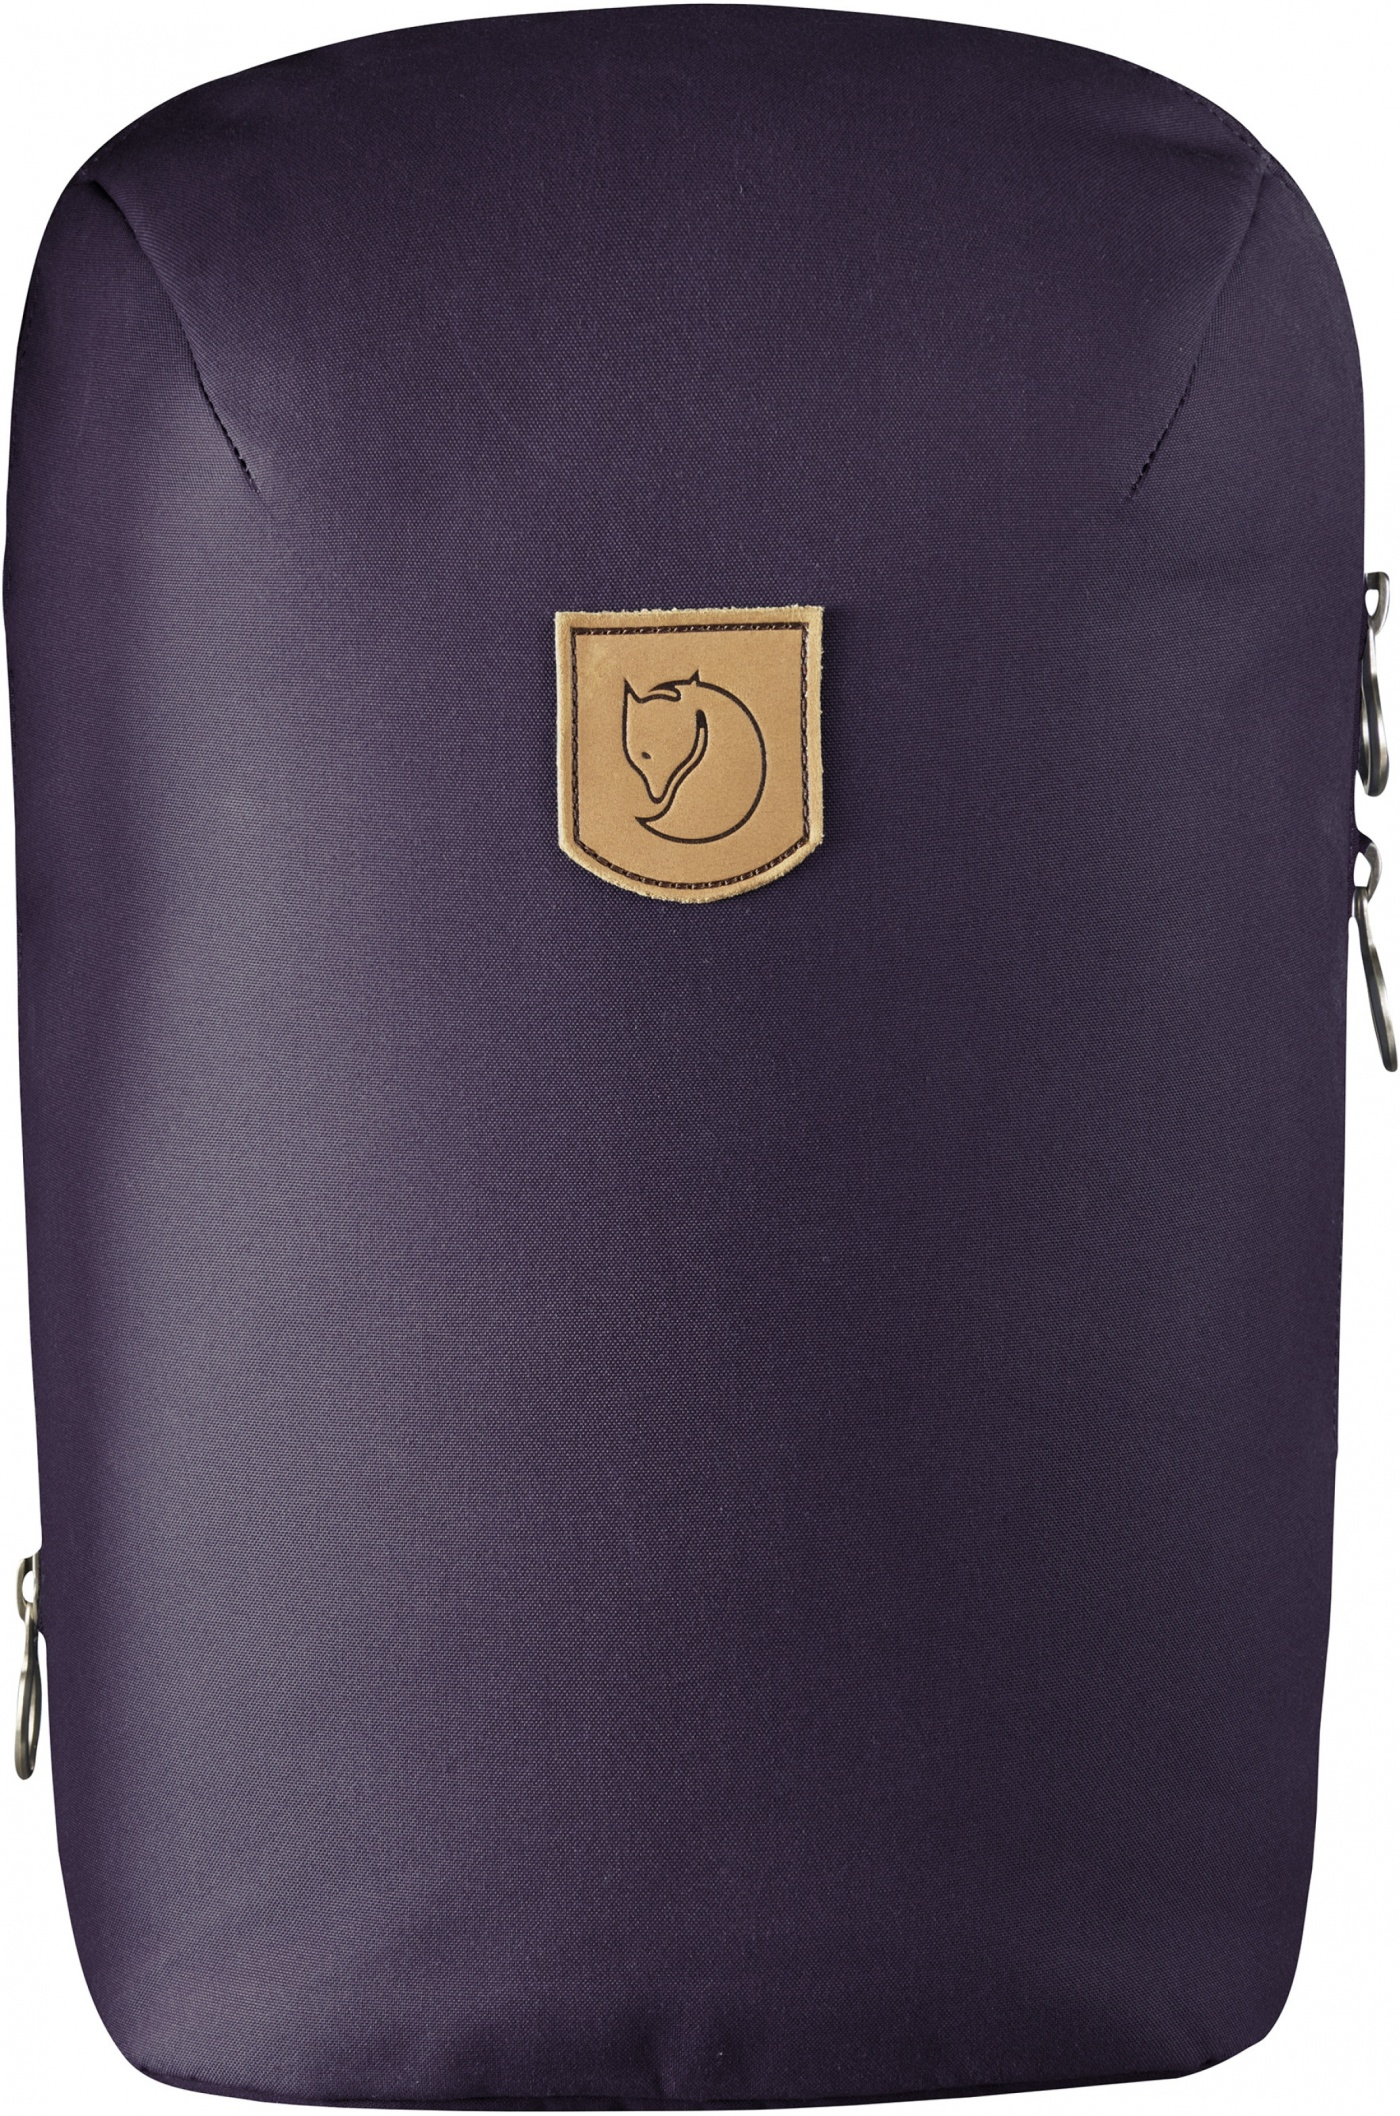 FjallRaven Kiruna Backpack Small Alpine Purple-30